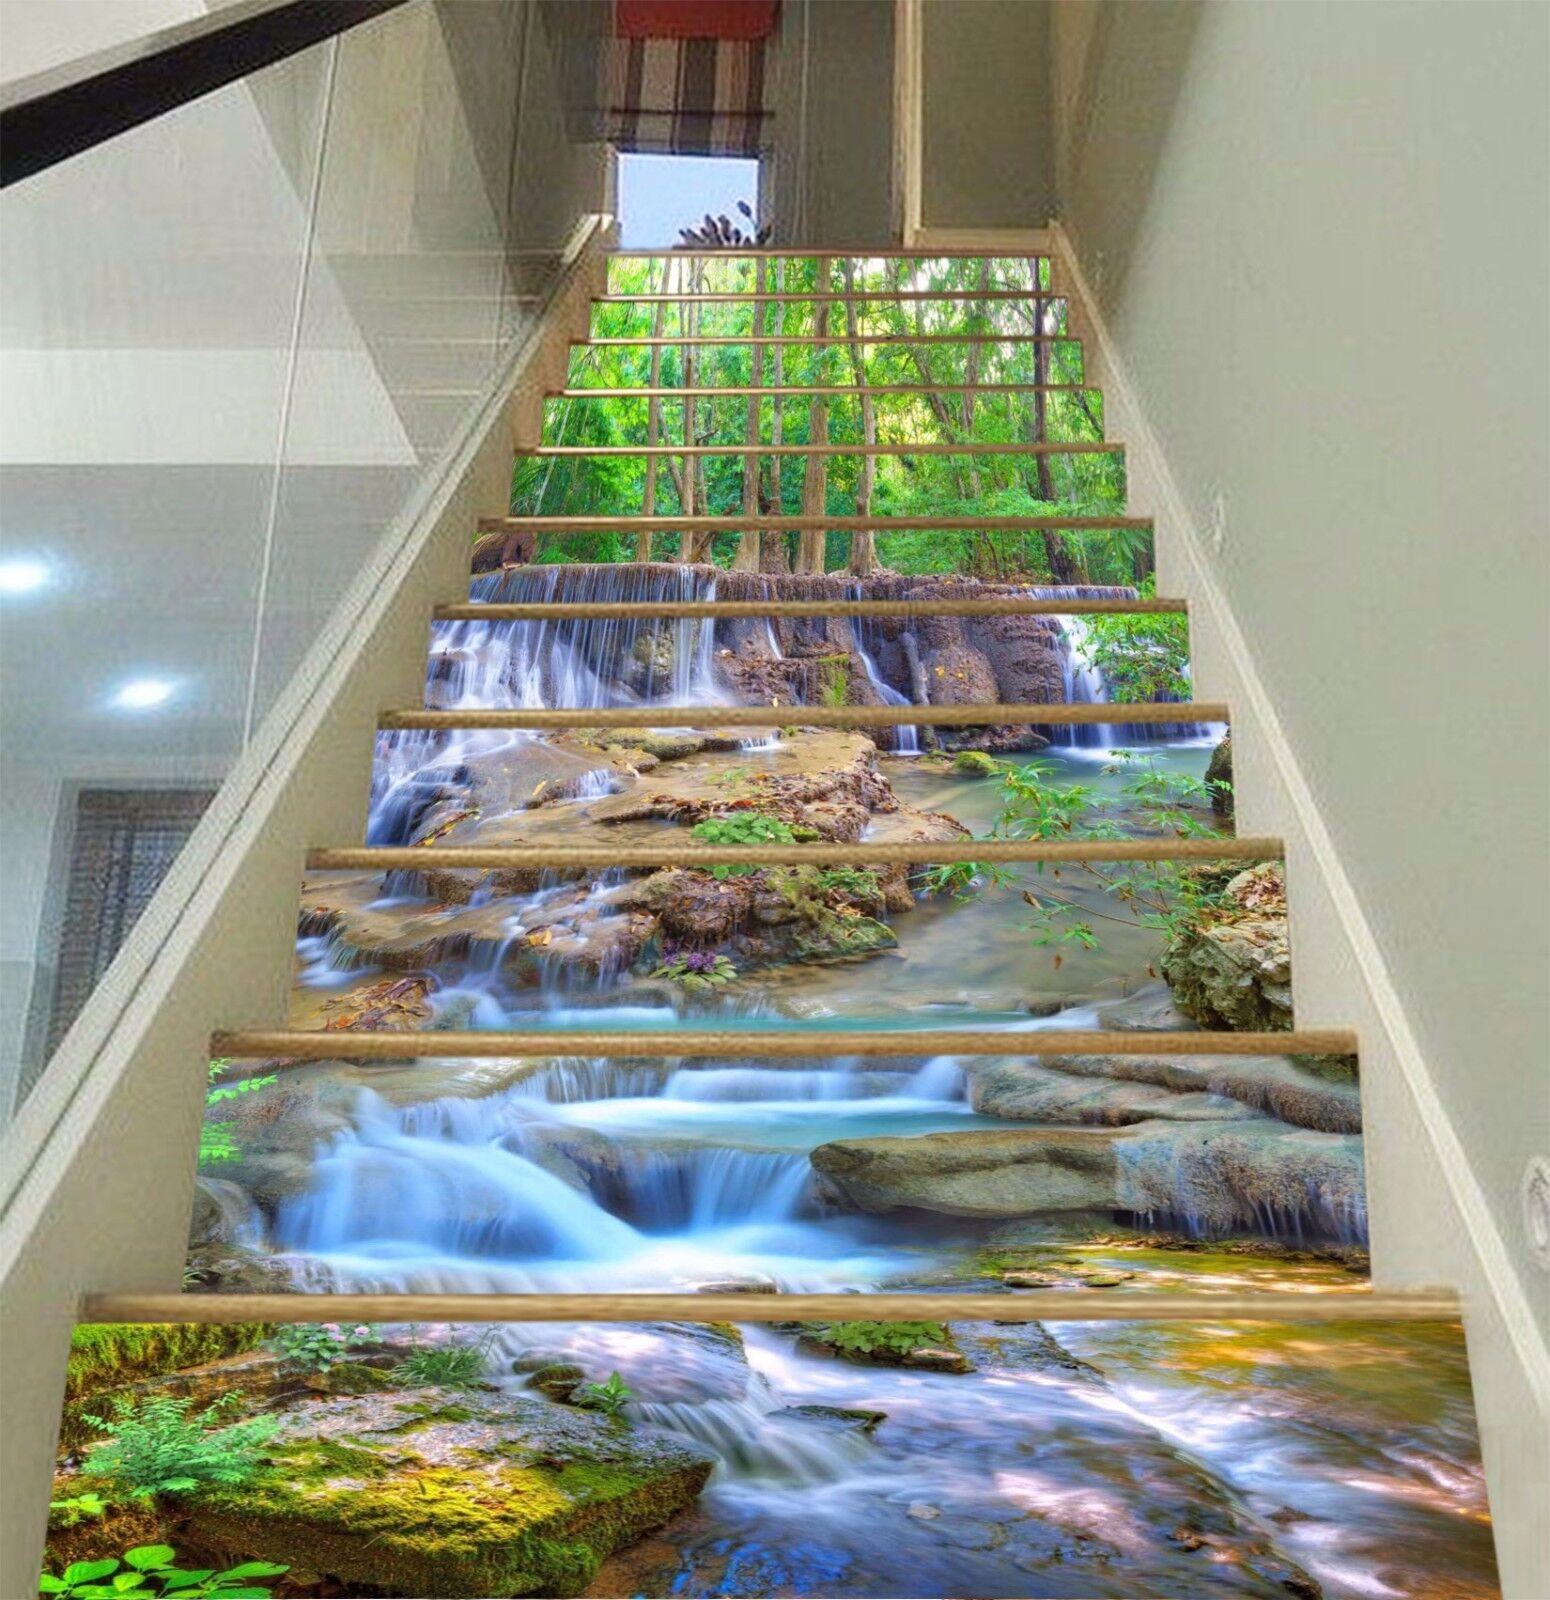 3D Forest Creek 152 Risers Decoration Photo Mural Vinyl Decal Wallpaper CA